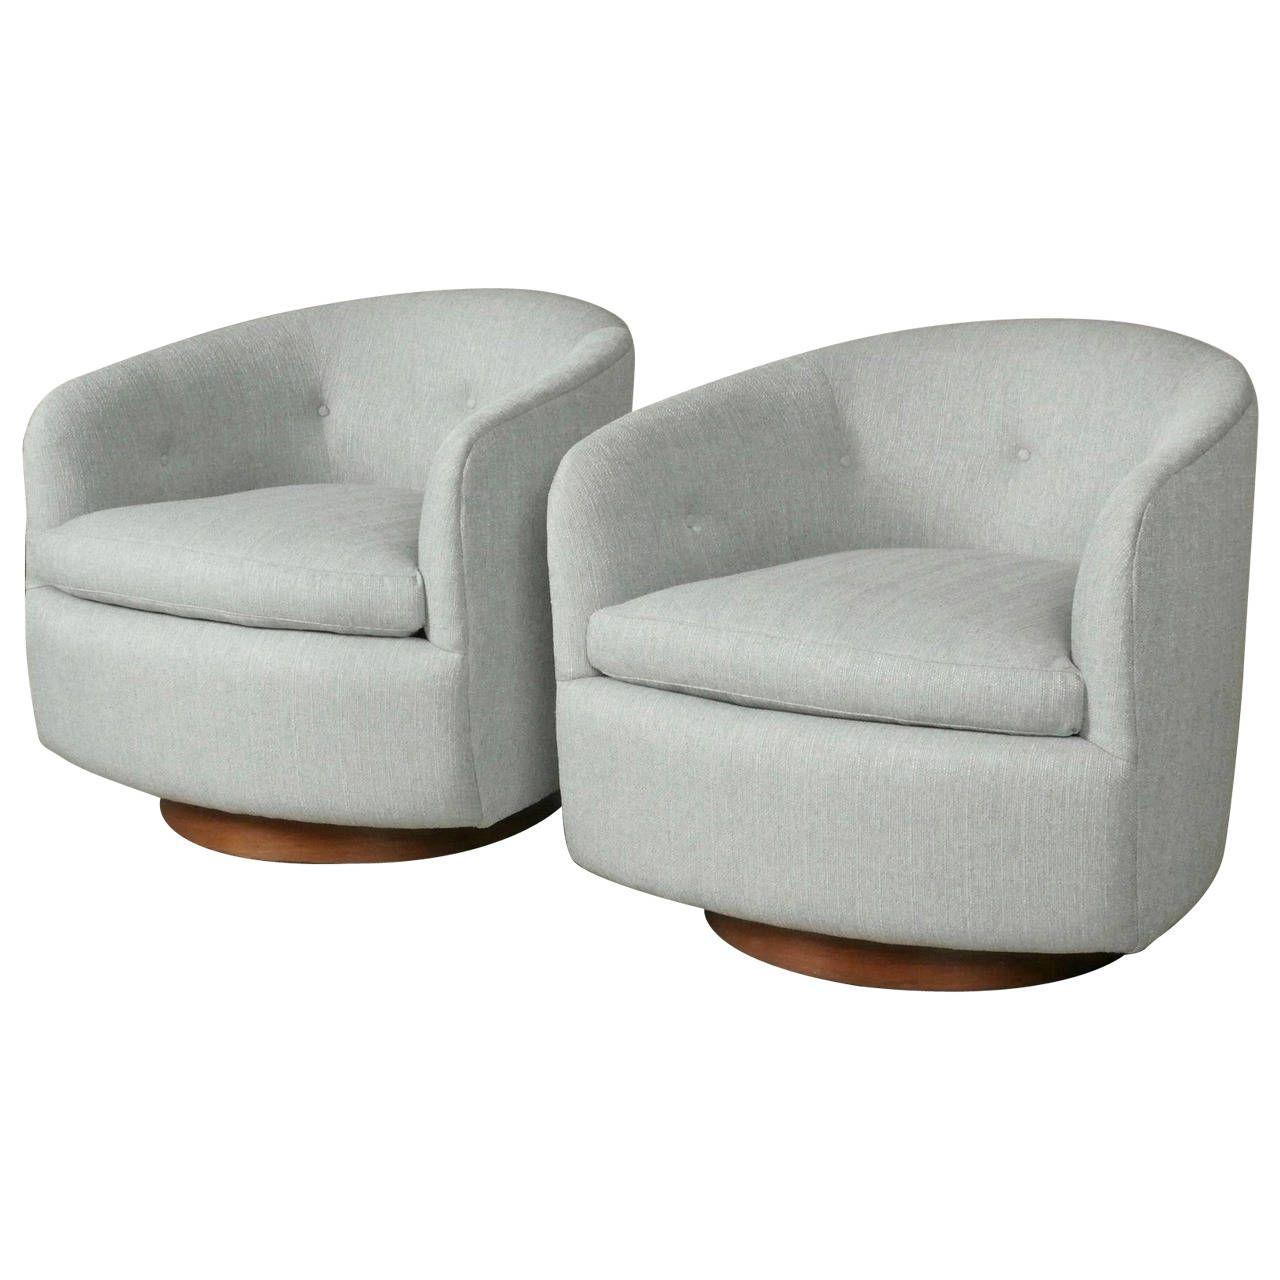 chair tub swivel front chairs seating viyet sea furniture vintage springer designer karl